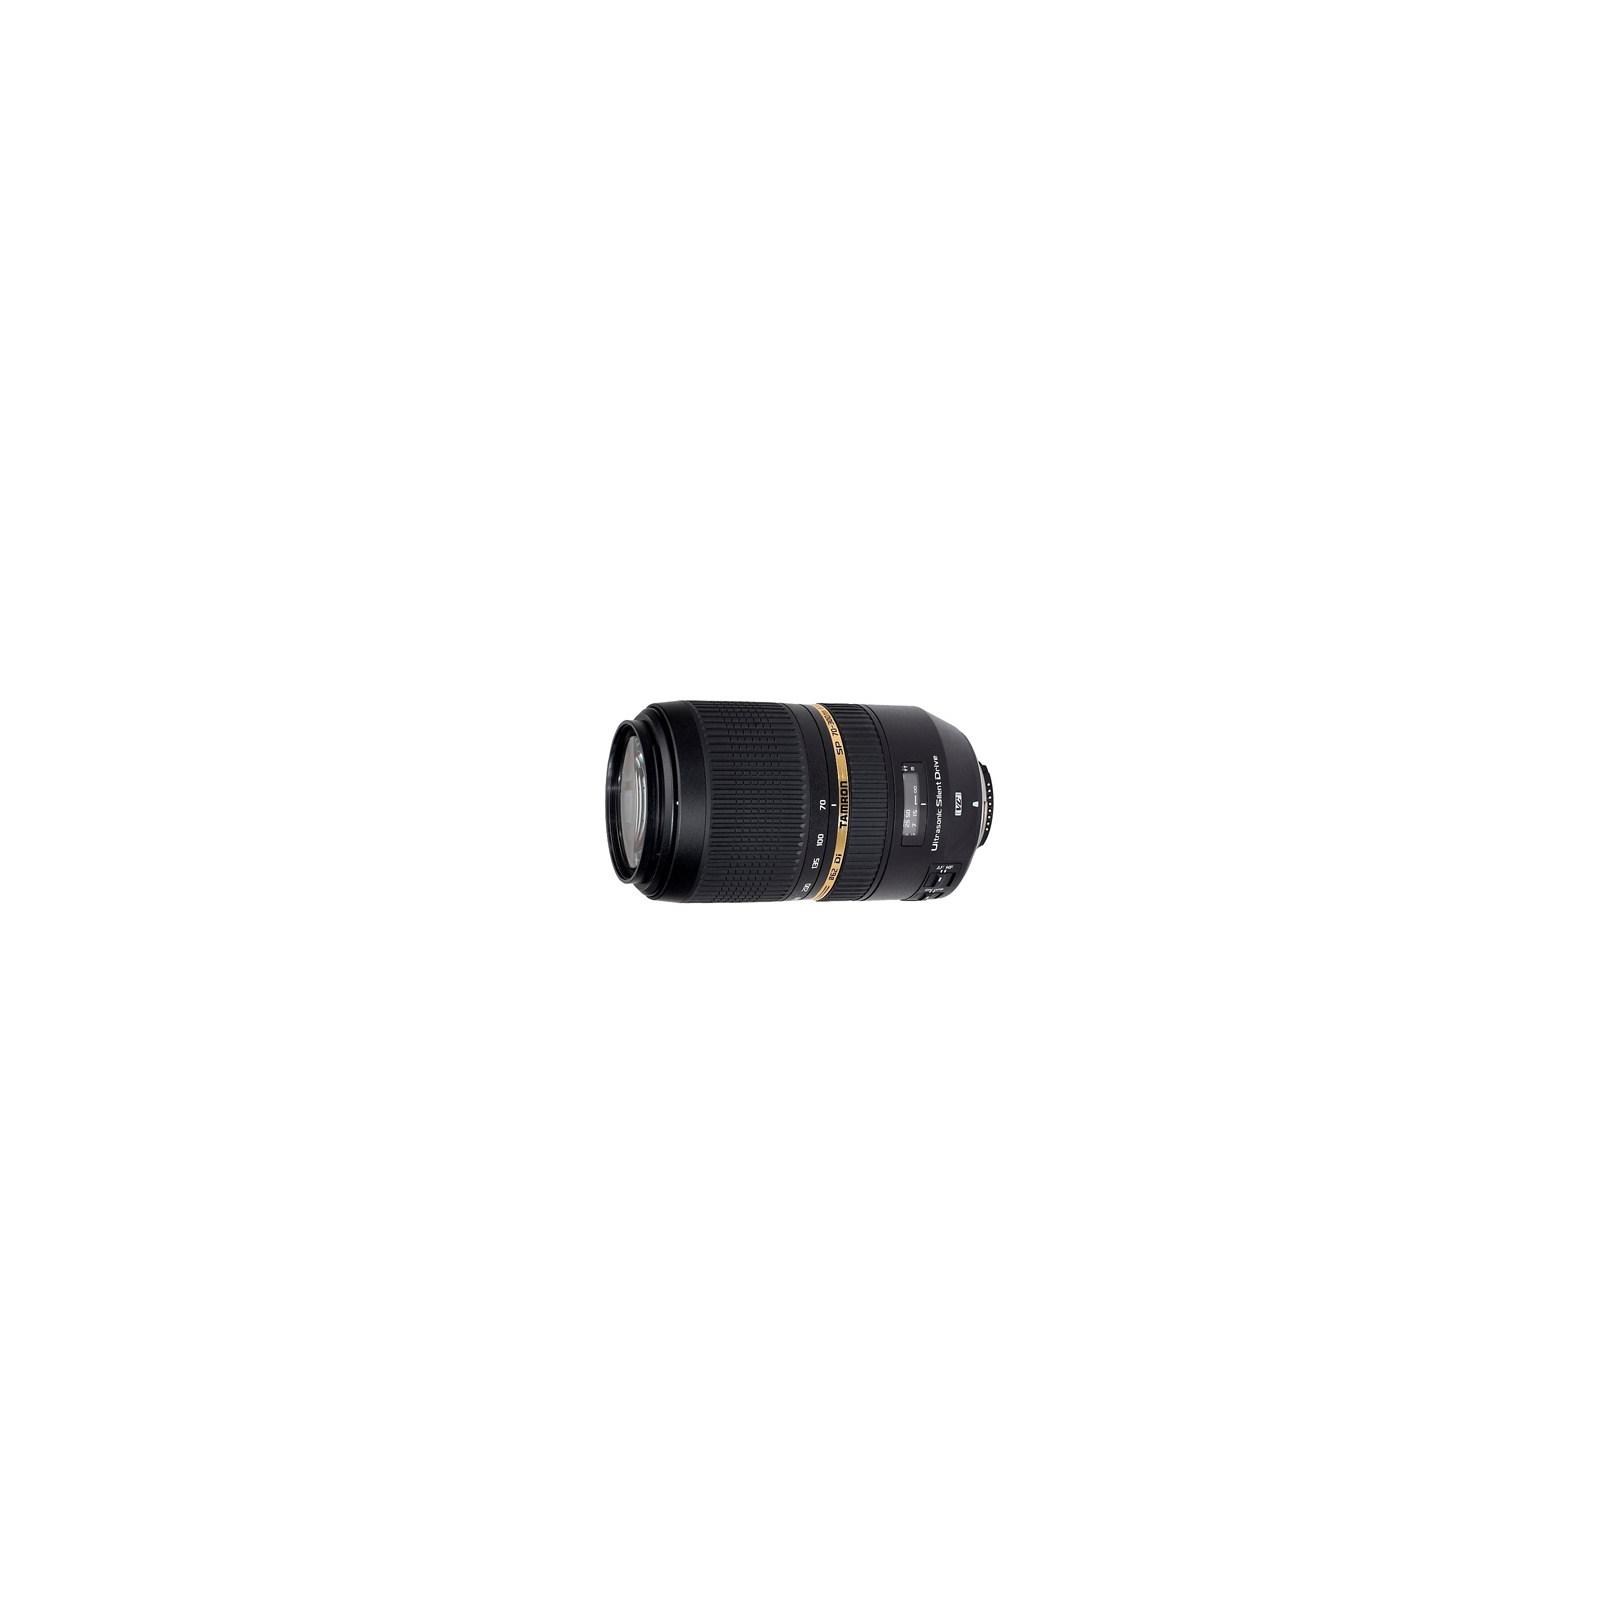 Объектив Tamron AF 70-300 f/4-5.6 Di VC USD for Nikon (AF 70-300mm VC for Nikon)